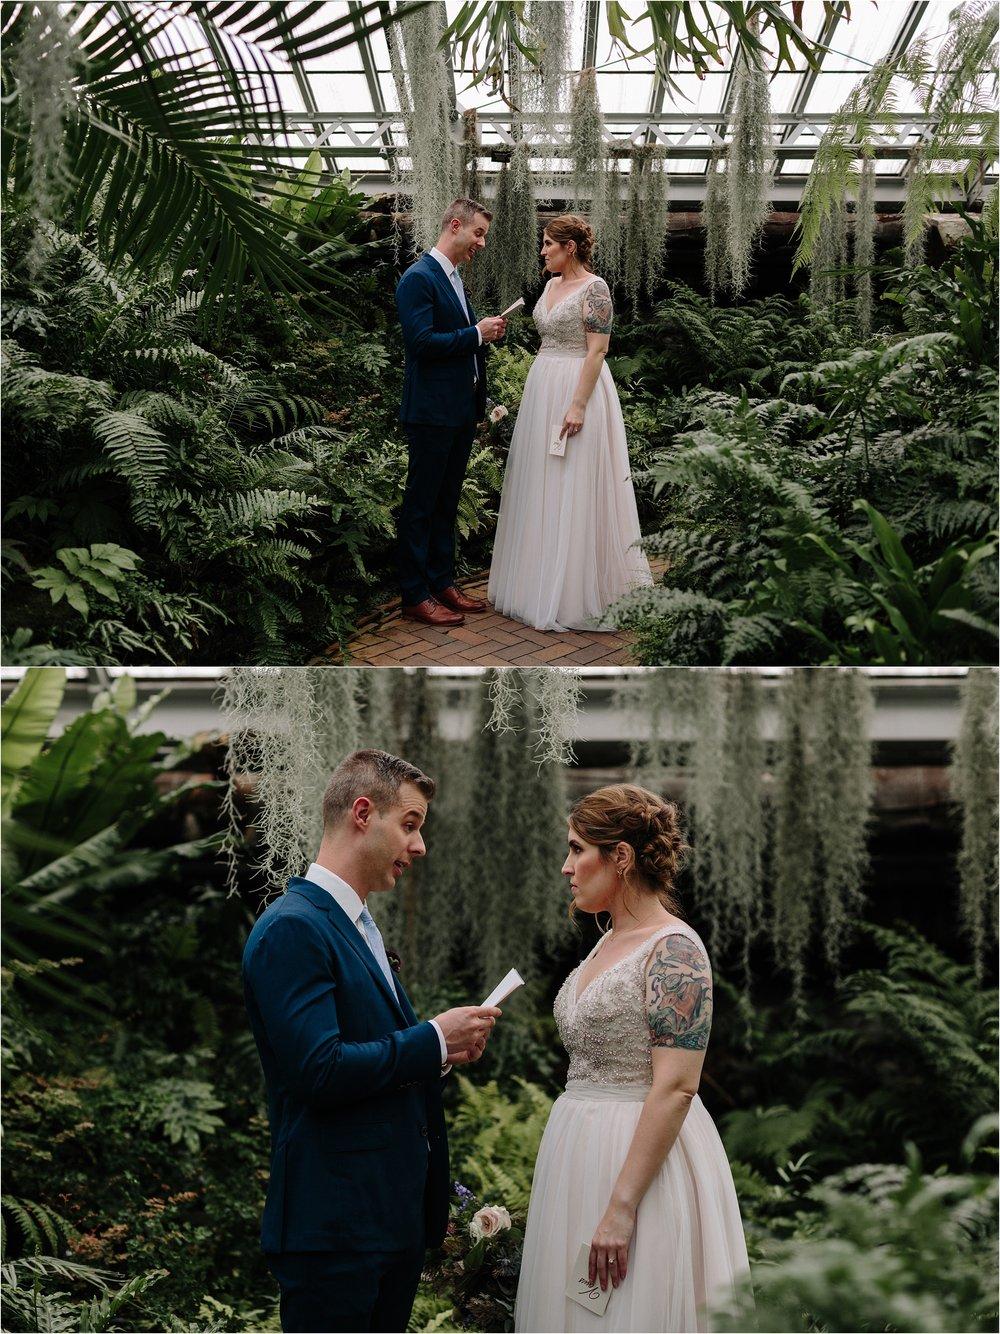 garfield-park-conservatory-wedding-94.jpg